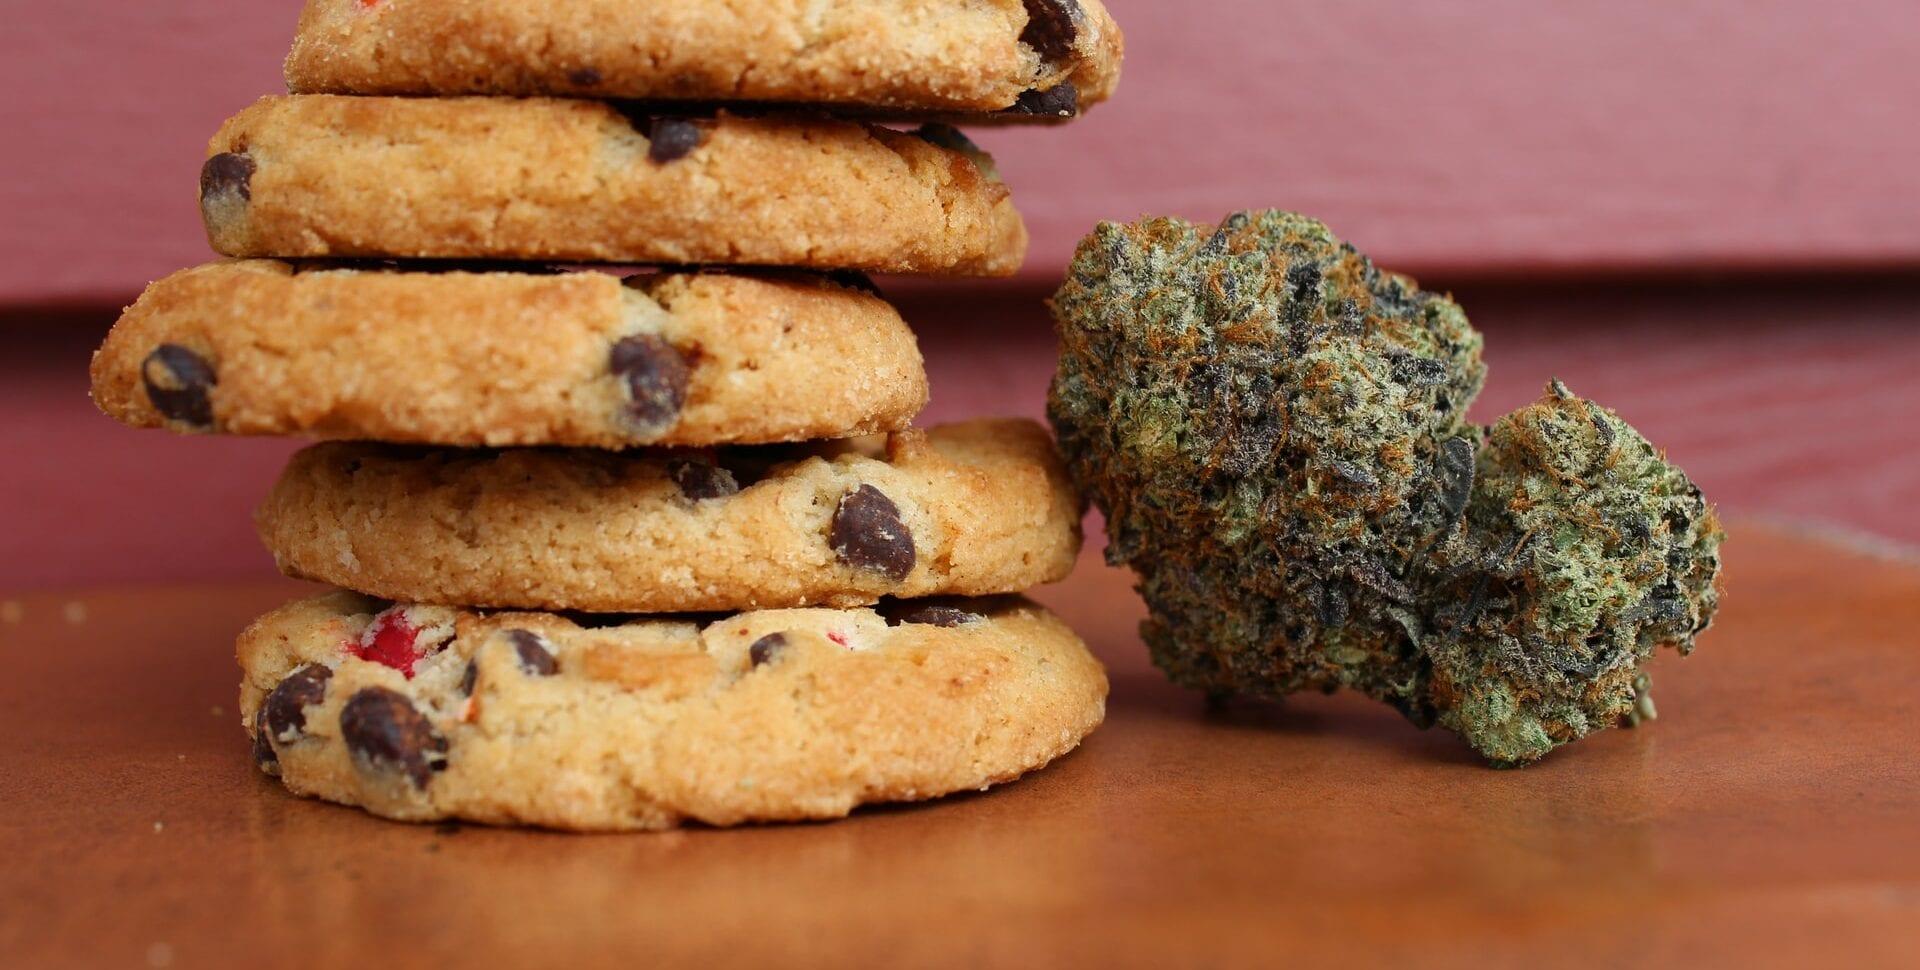 comestibles cannabis